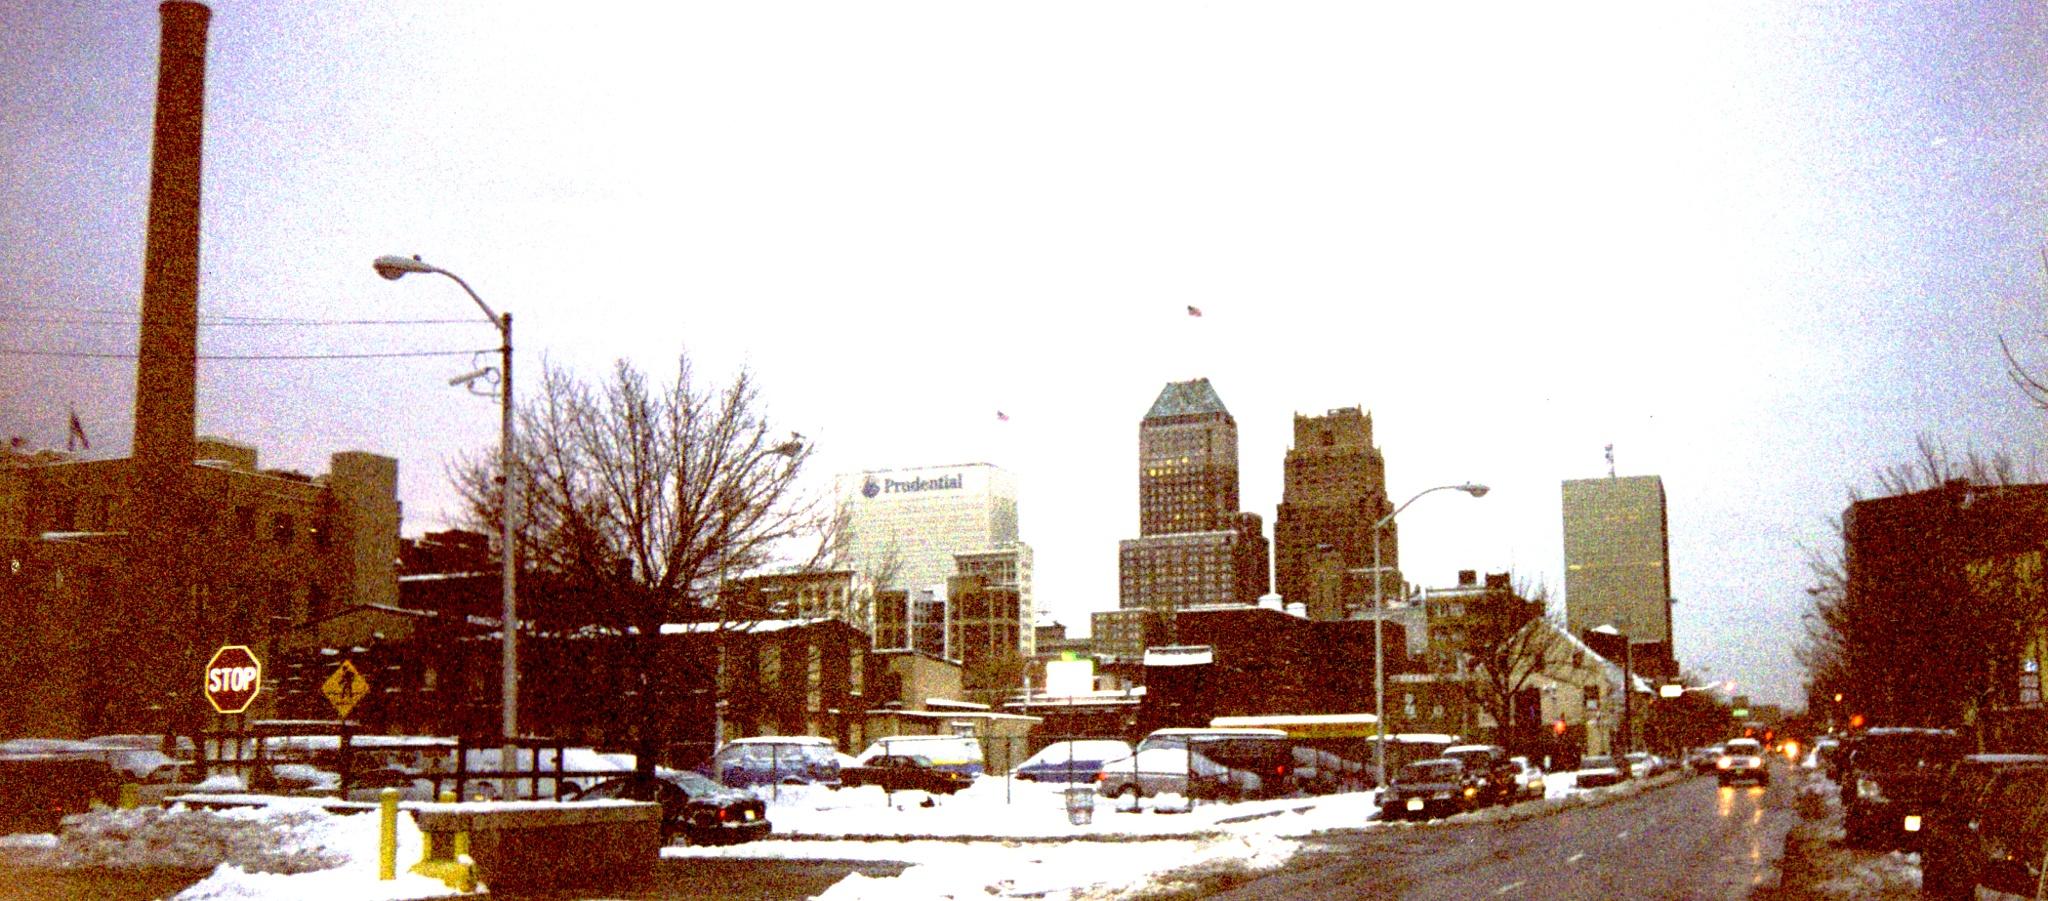 Newark,New Jersey Winter 2002 by Miguelvillega